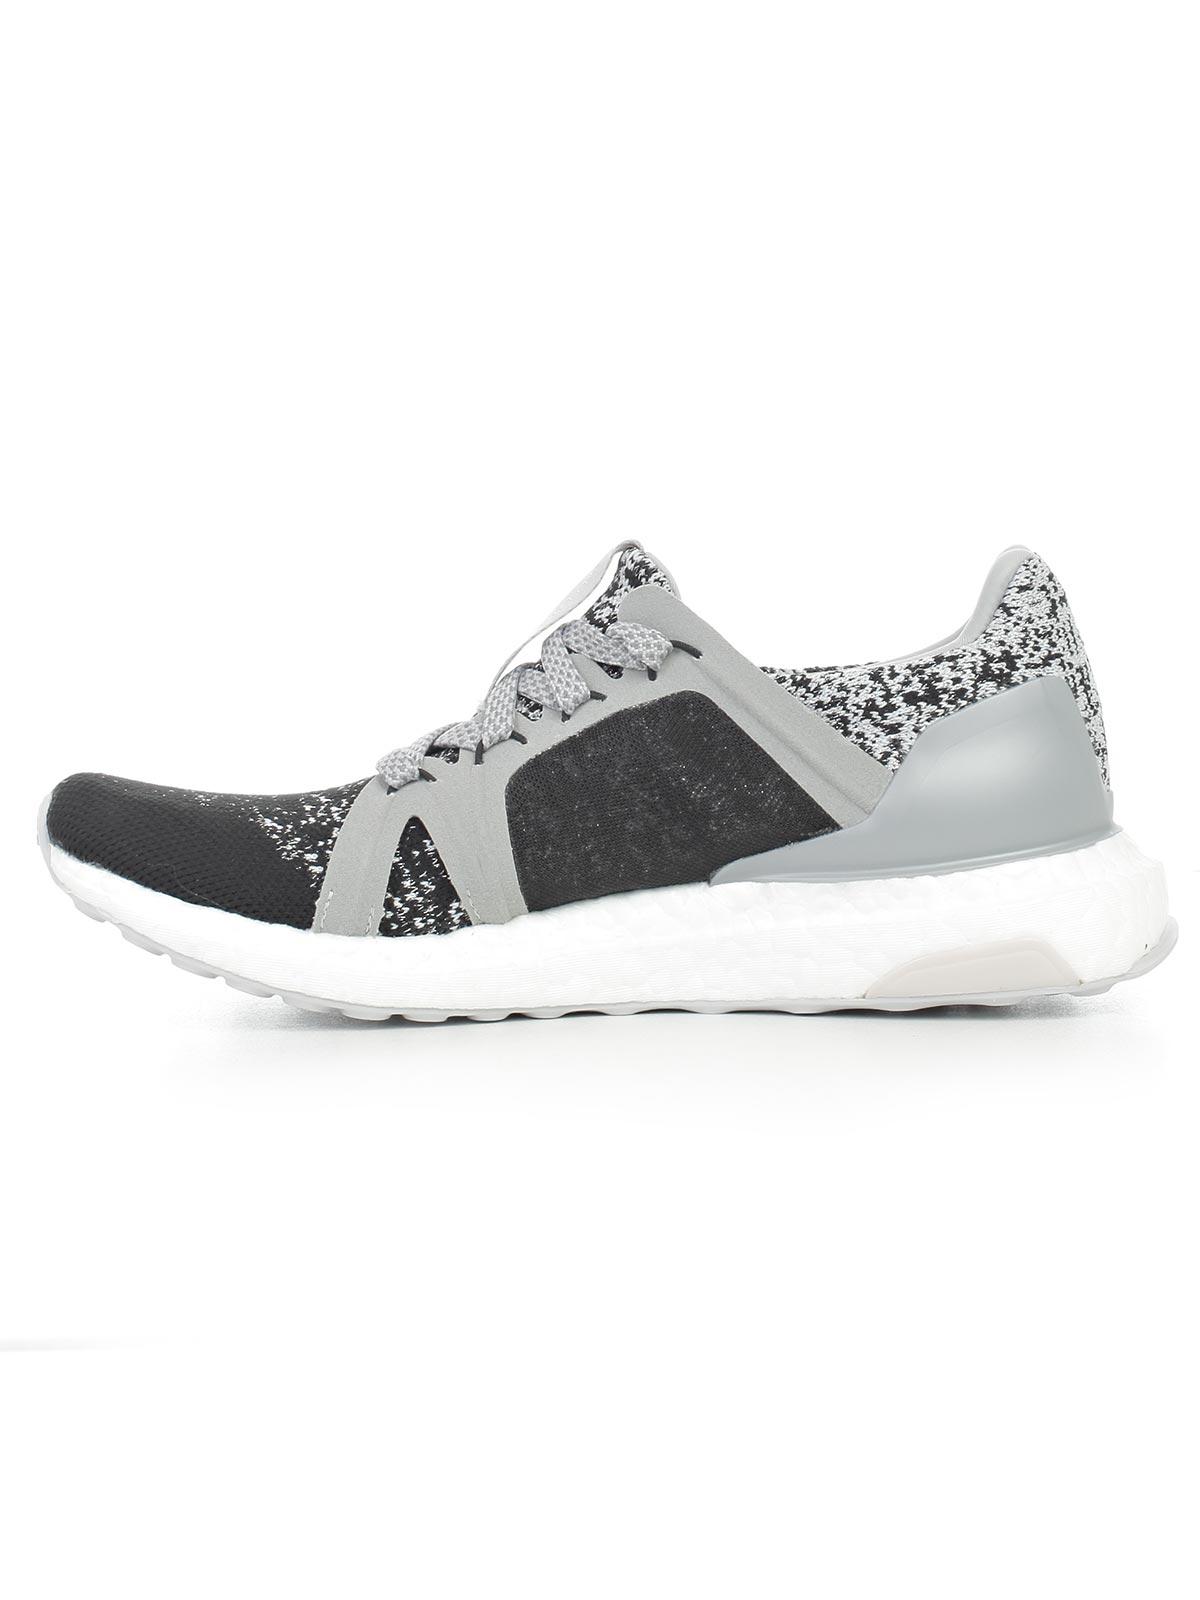 Adidas By Stella Mccartney Footwear S80846 - SILVER MET GREY GREEN